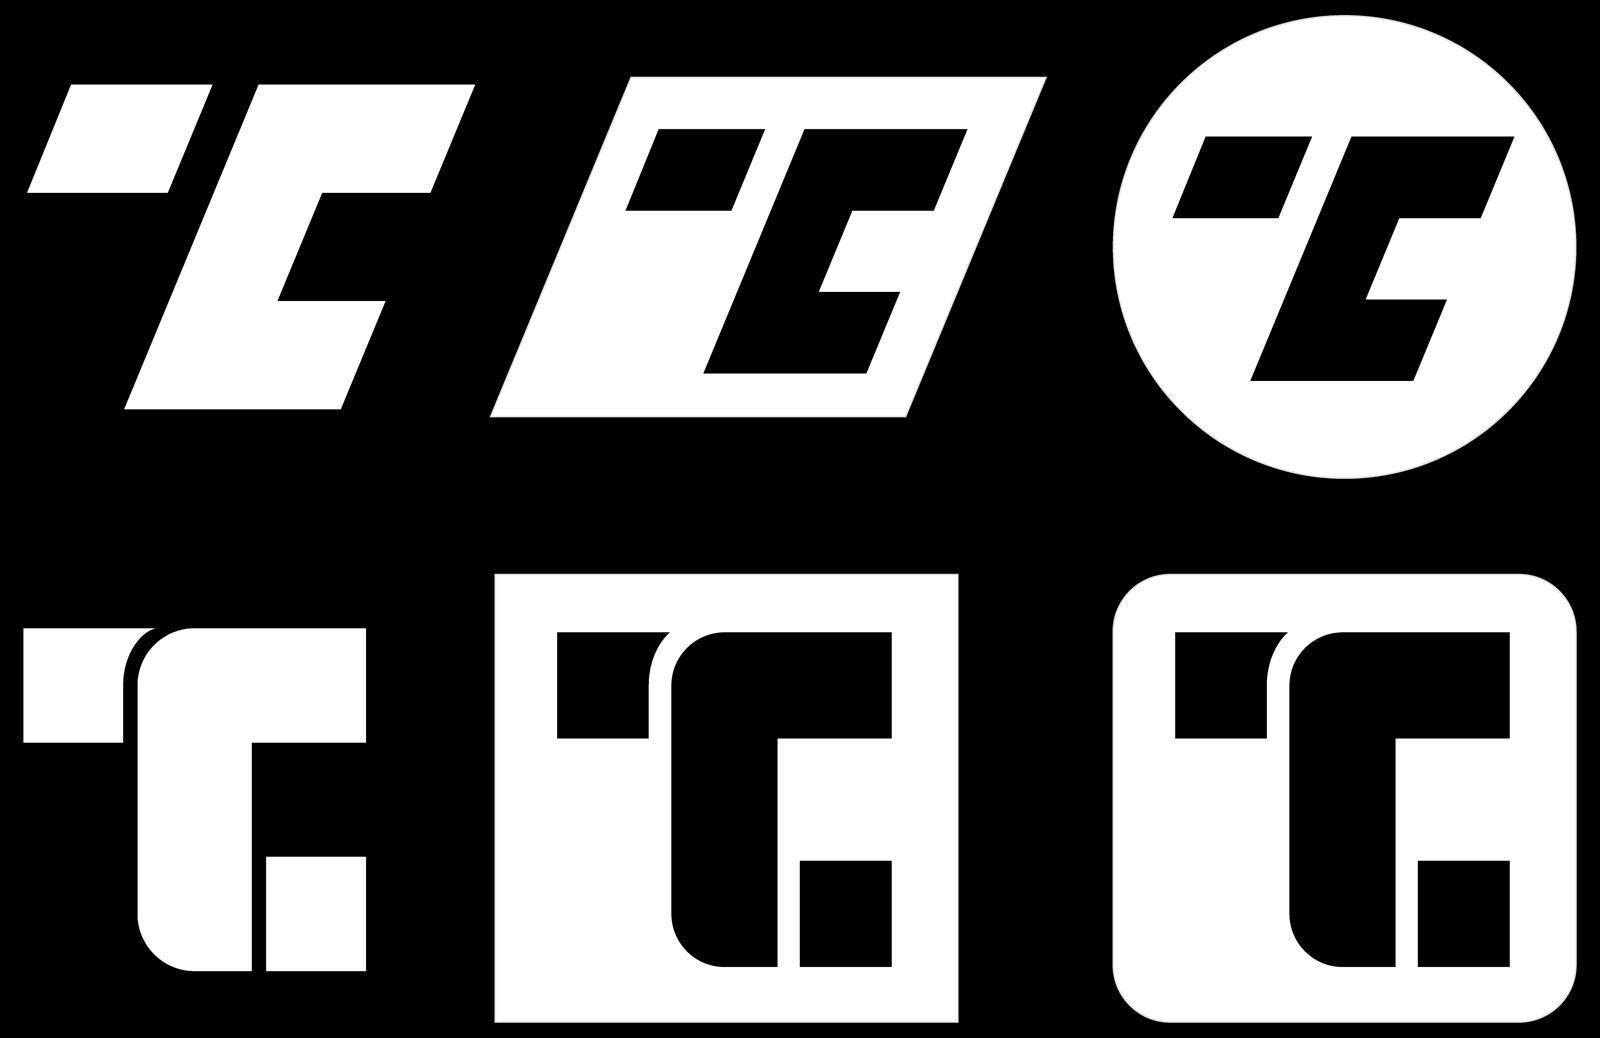 Personal logo design concepts.